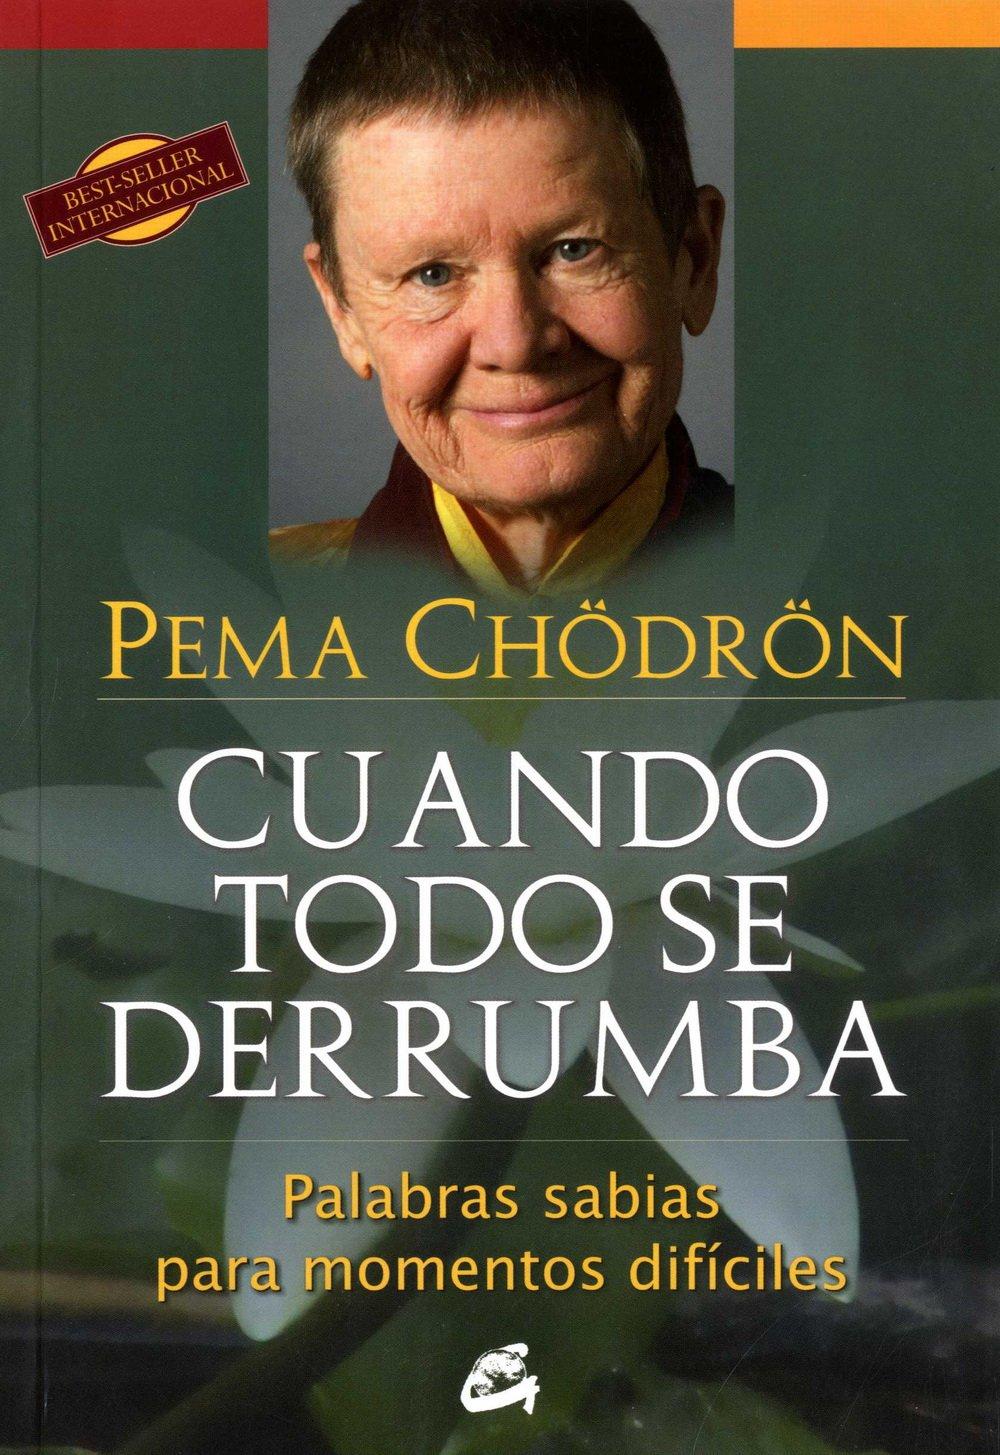 Cuando Todo Se Derrumba (Budismo) Tapa blanda – 15 feb 2013 Pema Chödrön Miguel Iribarren Berrade Gaia 8484454290